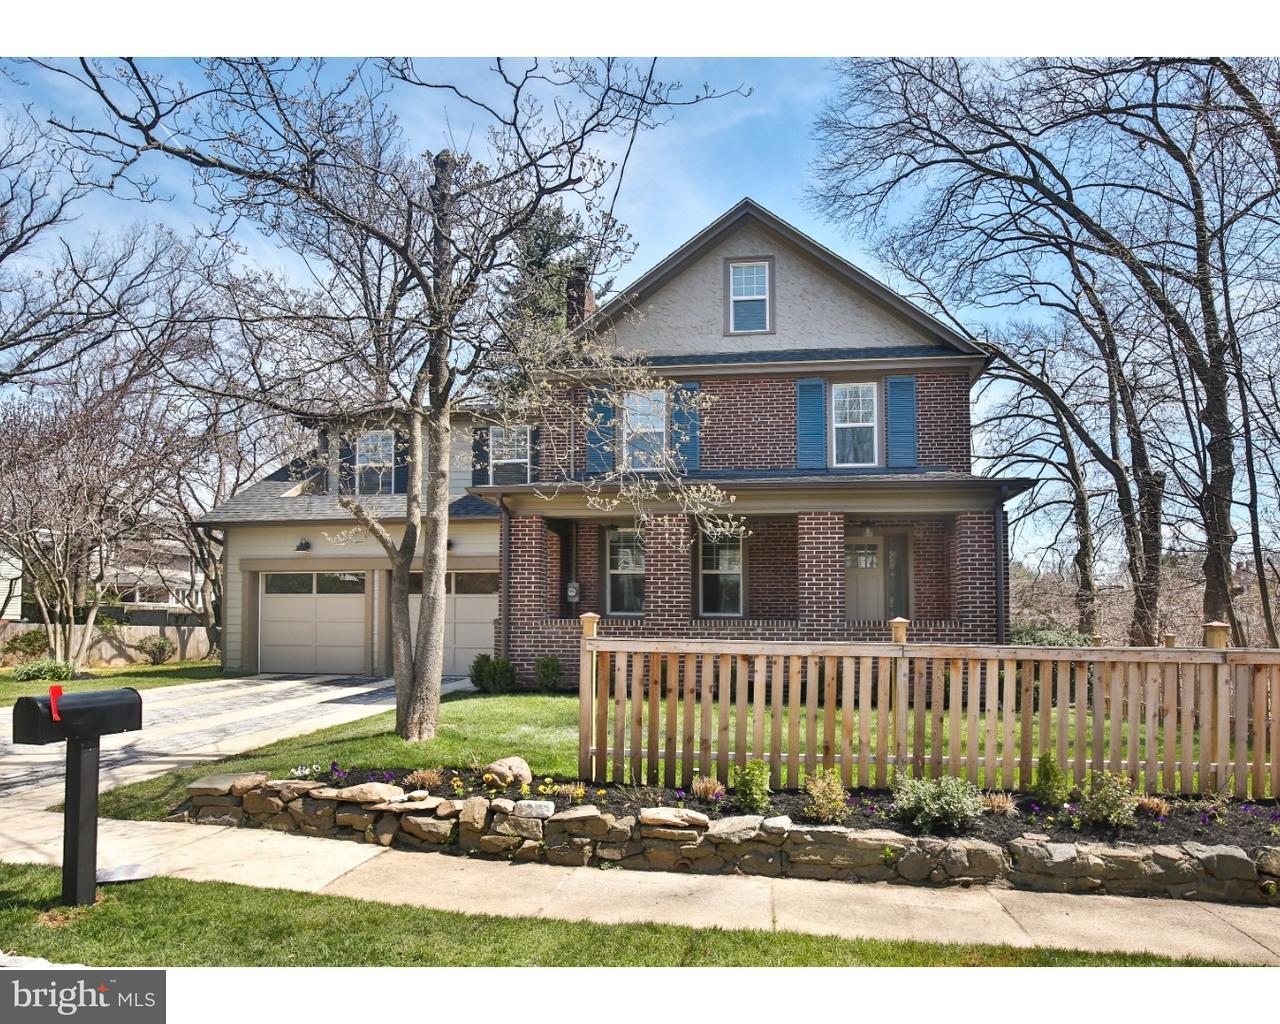 Single Family Home for Sale at 117 GLYNN Lane Wayne, Pennsylvania 19087 United States